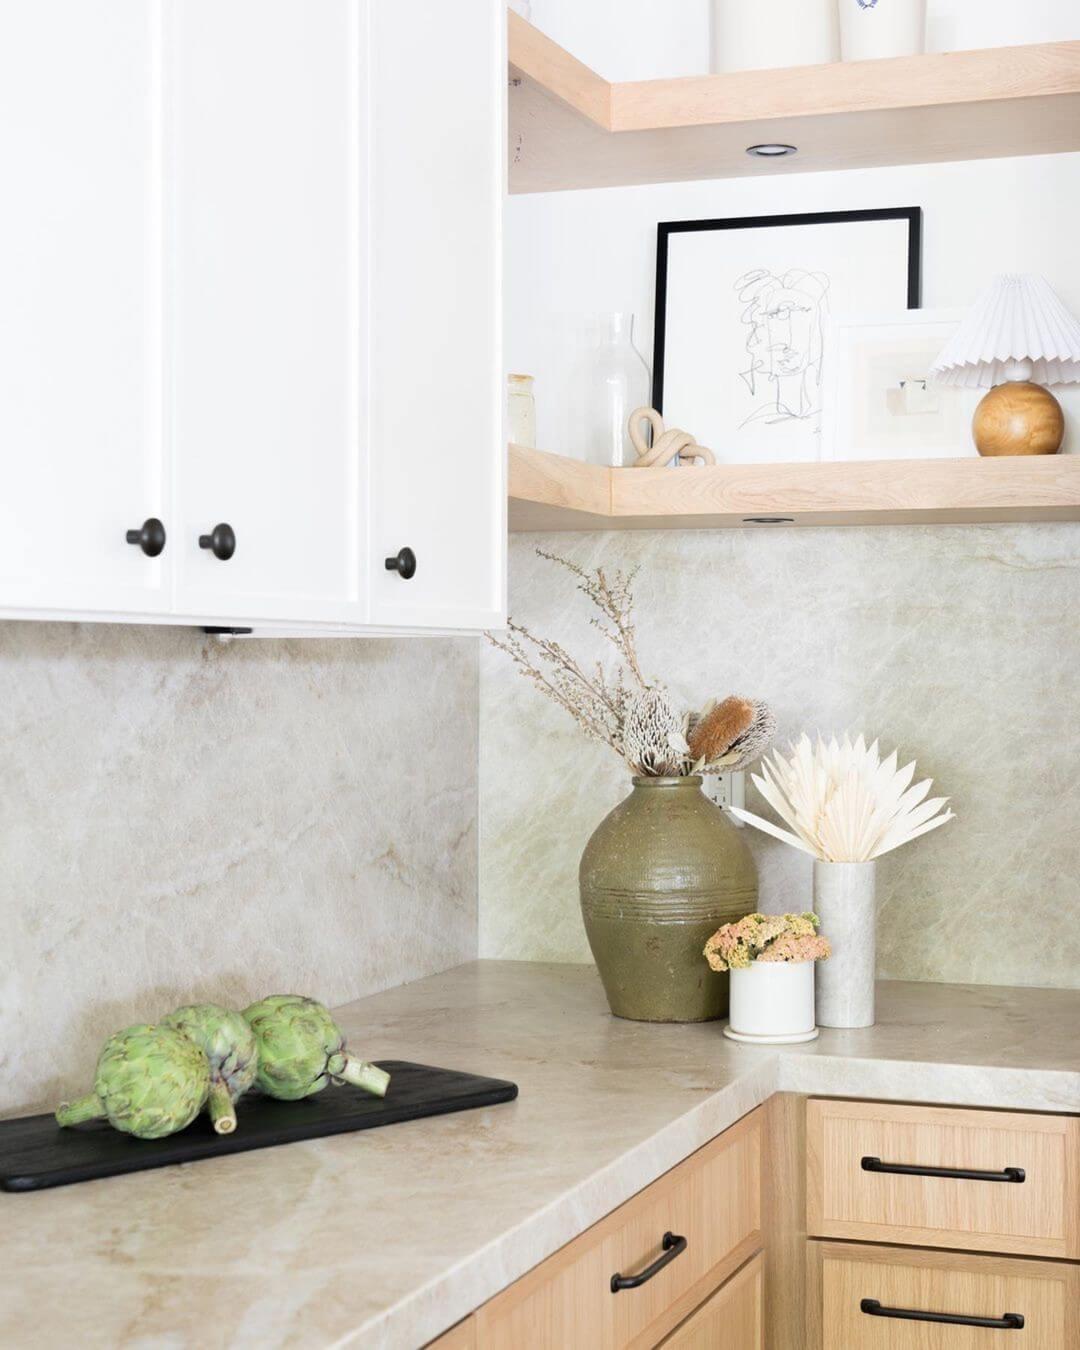 Quartz vs Granite Countertops Pros & Cons